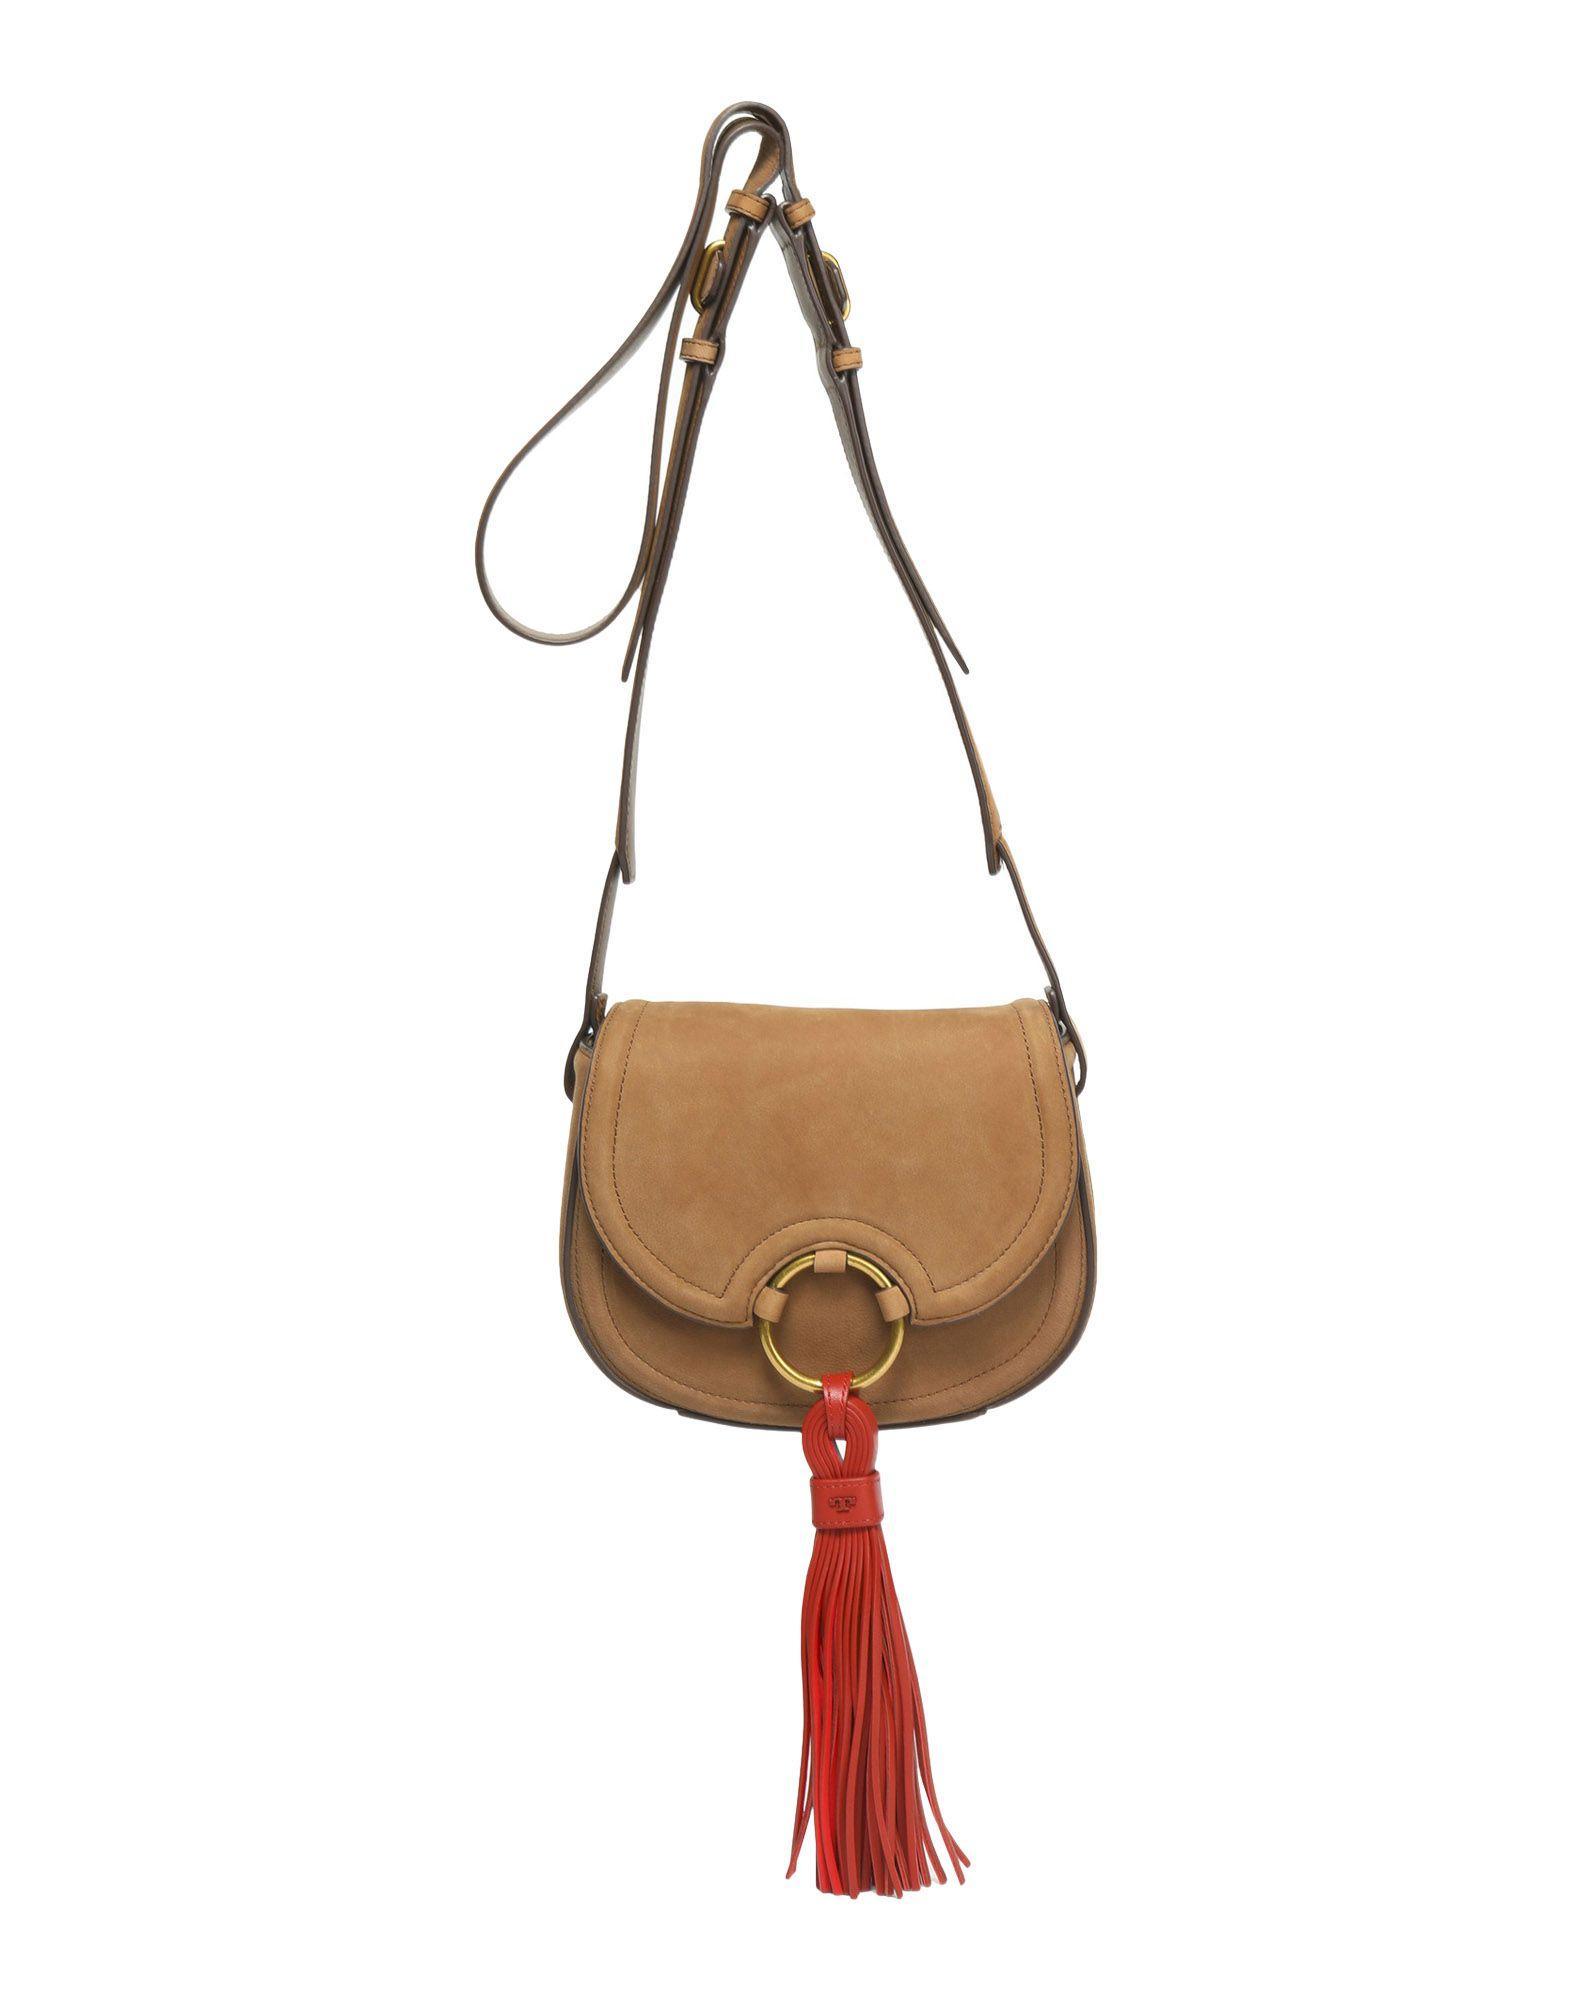 66bb7e00025 Tory Burch Handbags In Camel